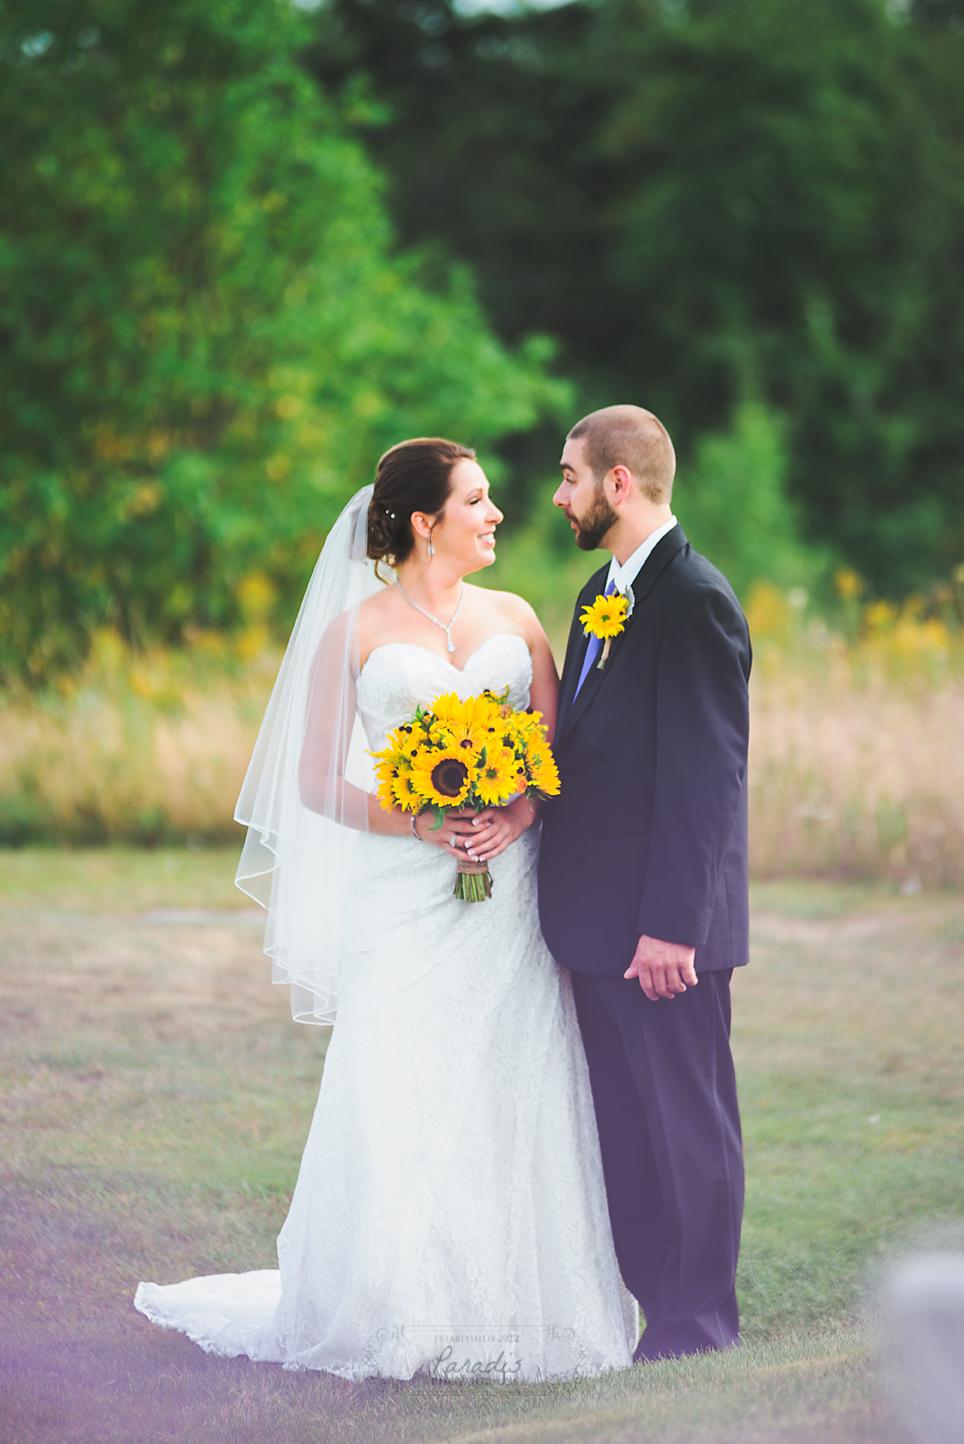 Just Married | Paradis Photography #MaineWeddingPhotographer